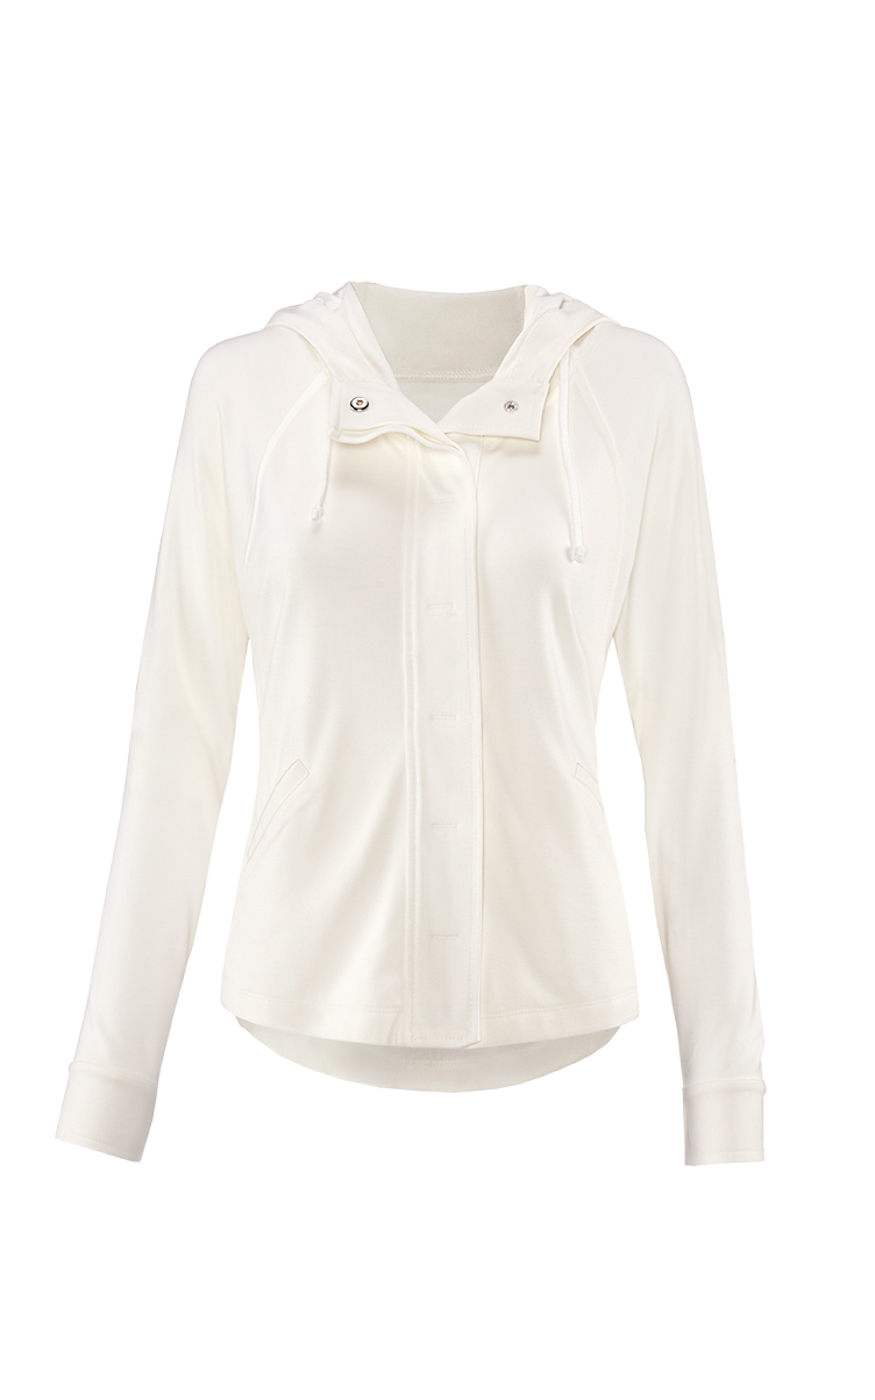 Sequin jacket Fraco   natural   Fracomina   Little Soho